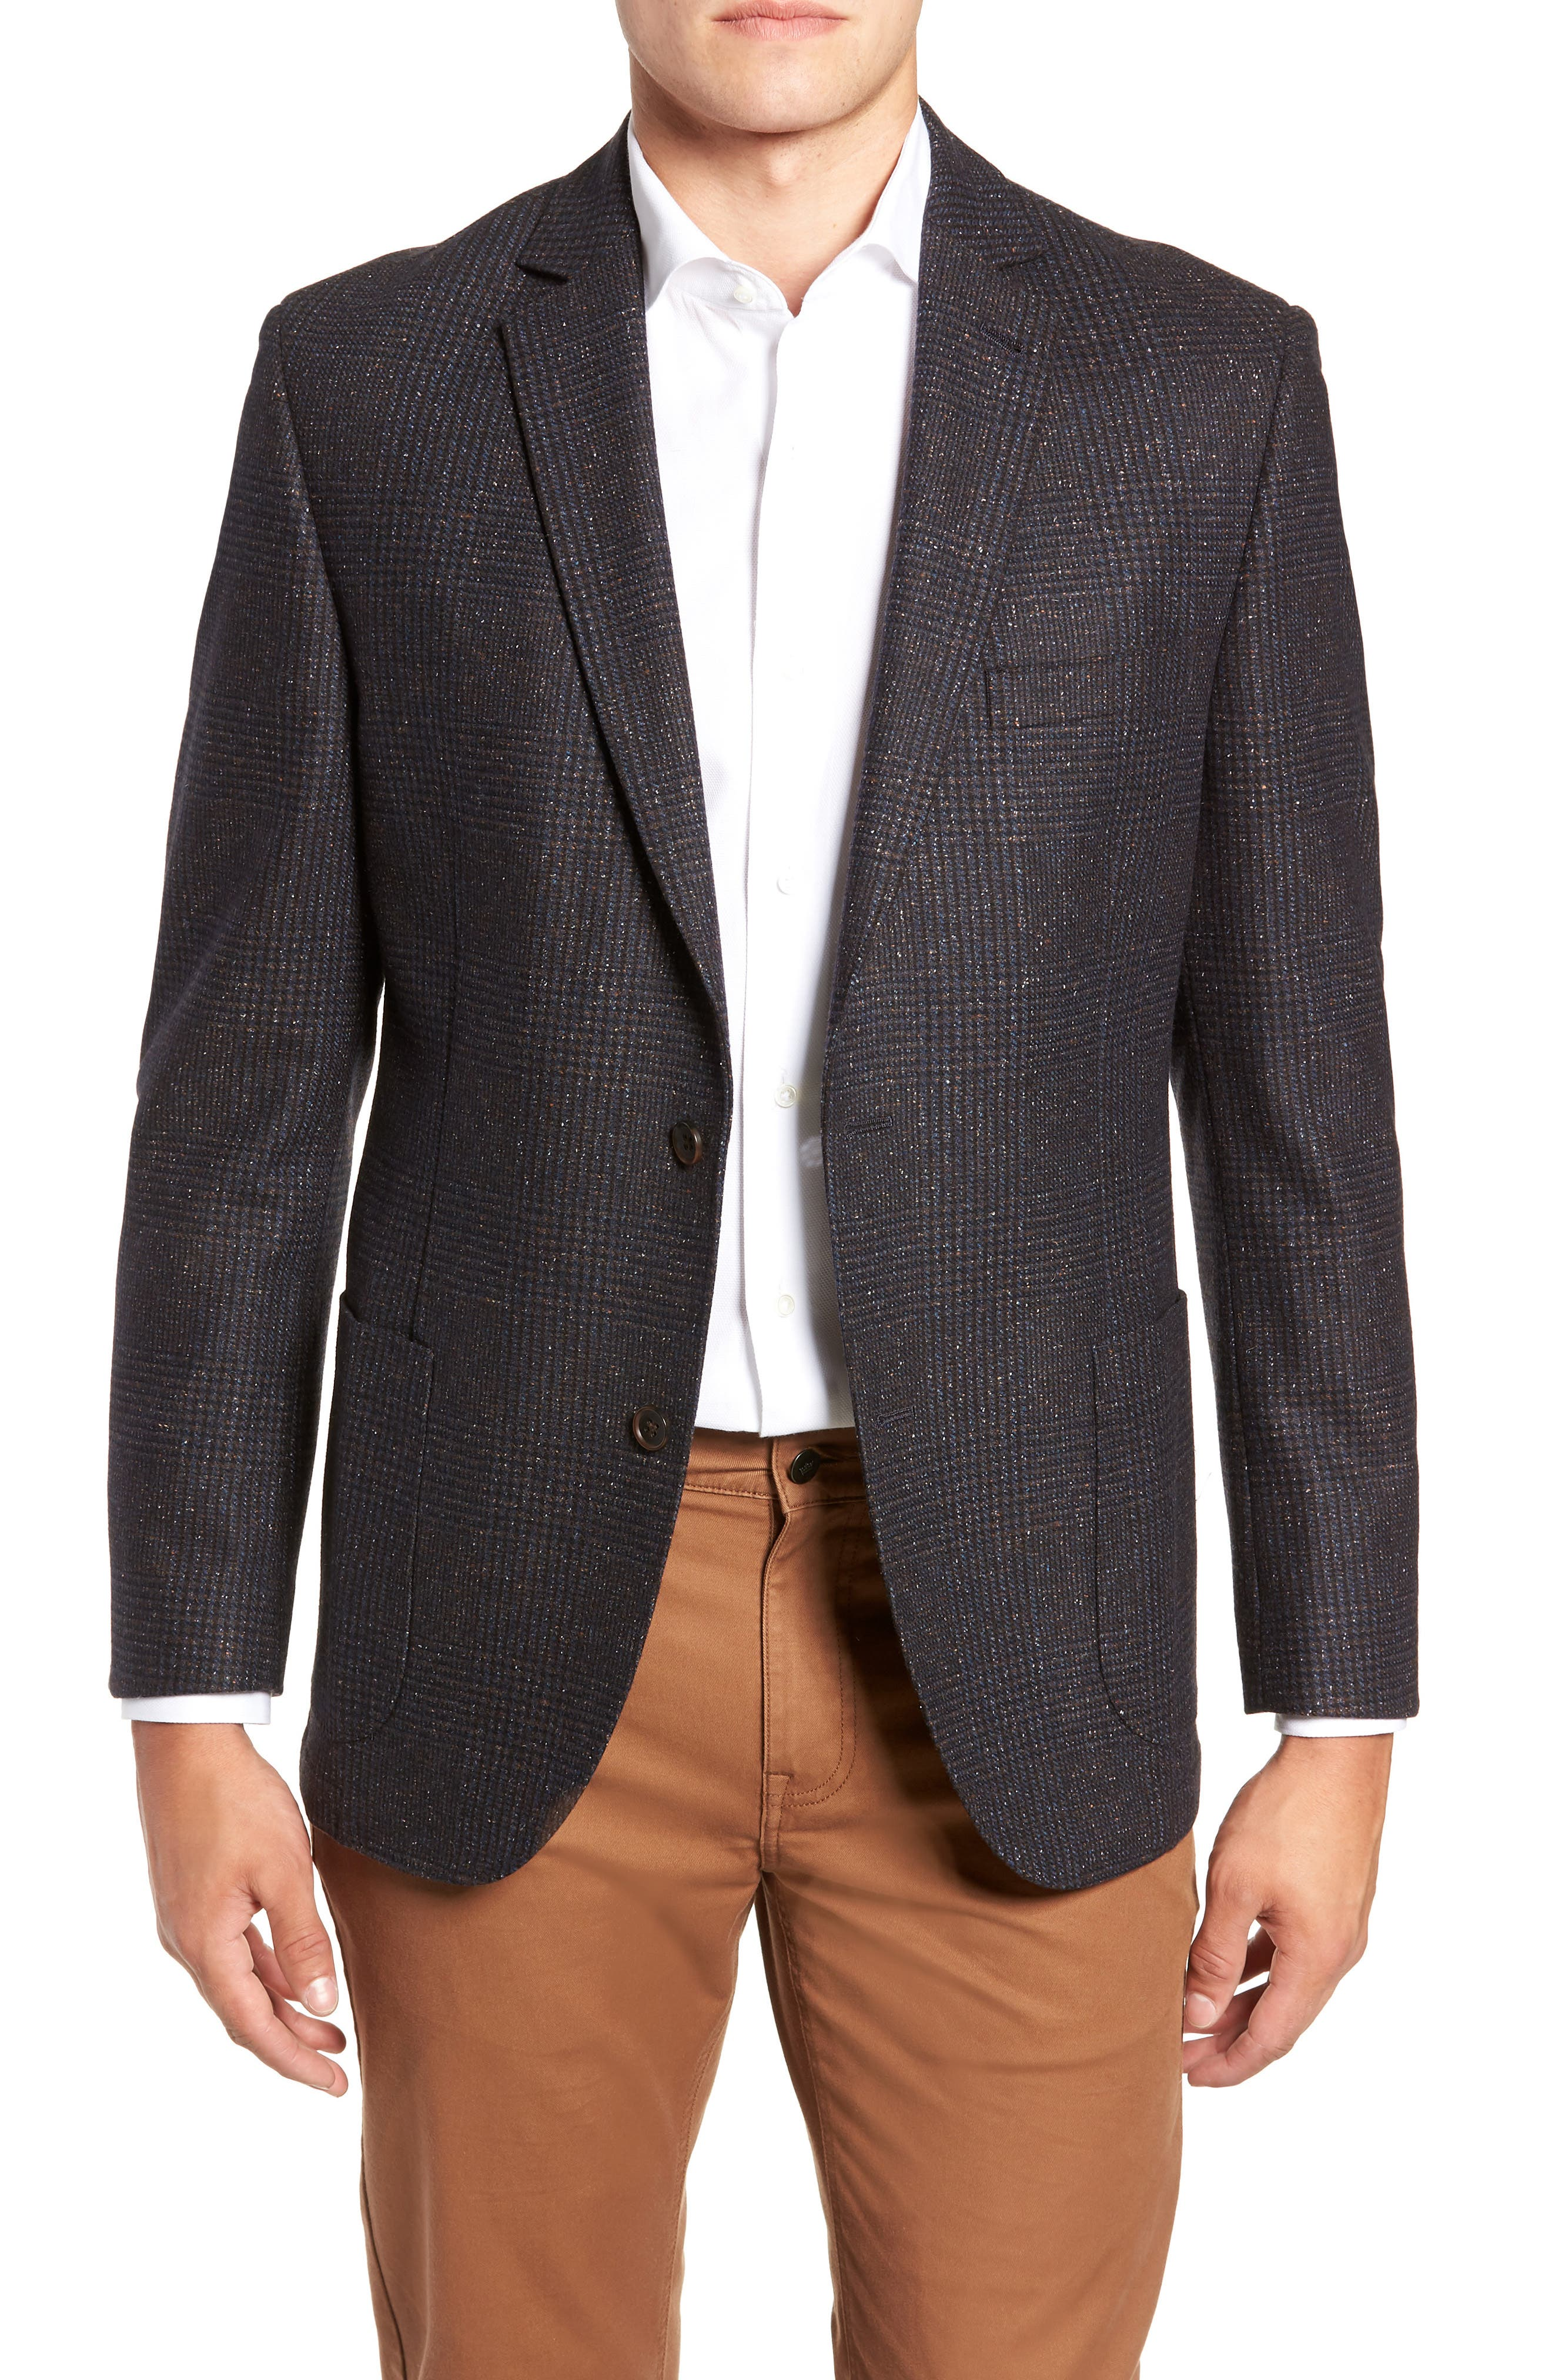 Regular Fit Wool & Silk Blend Blazer,                             Main thumbnail 1, color,                             BROWN